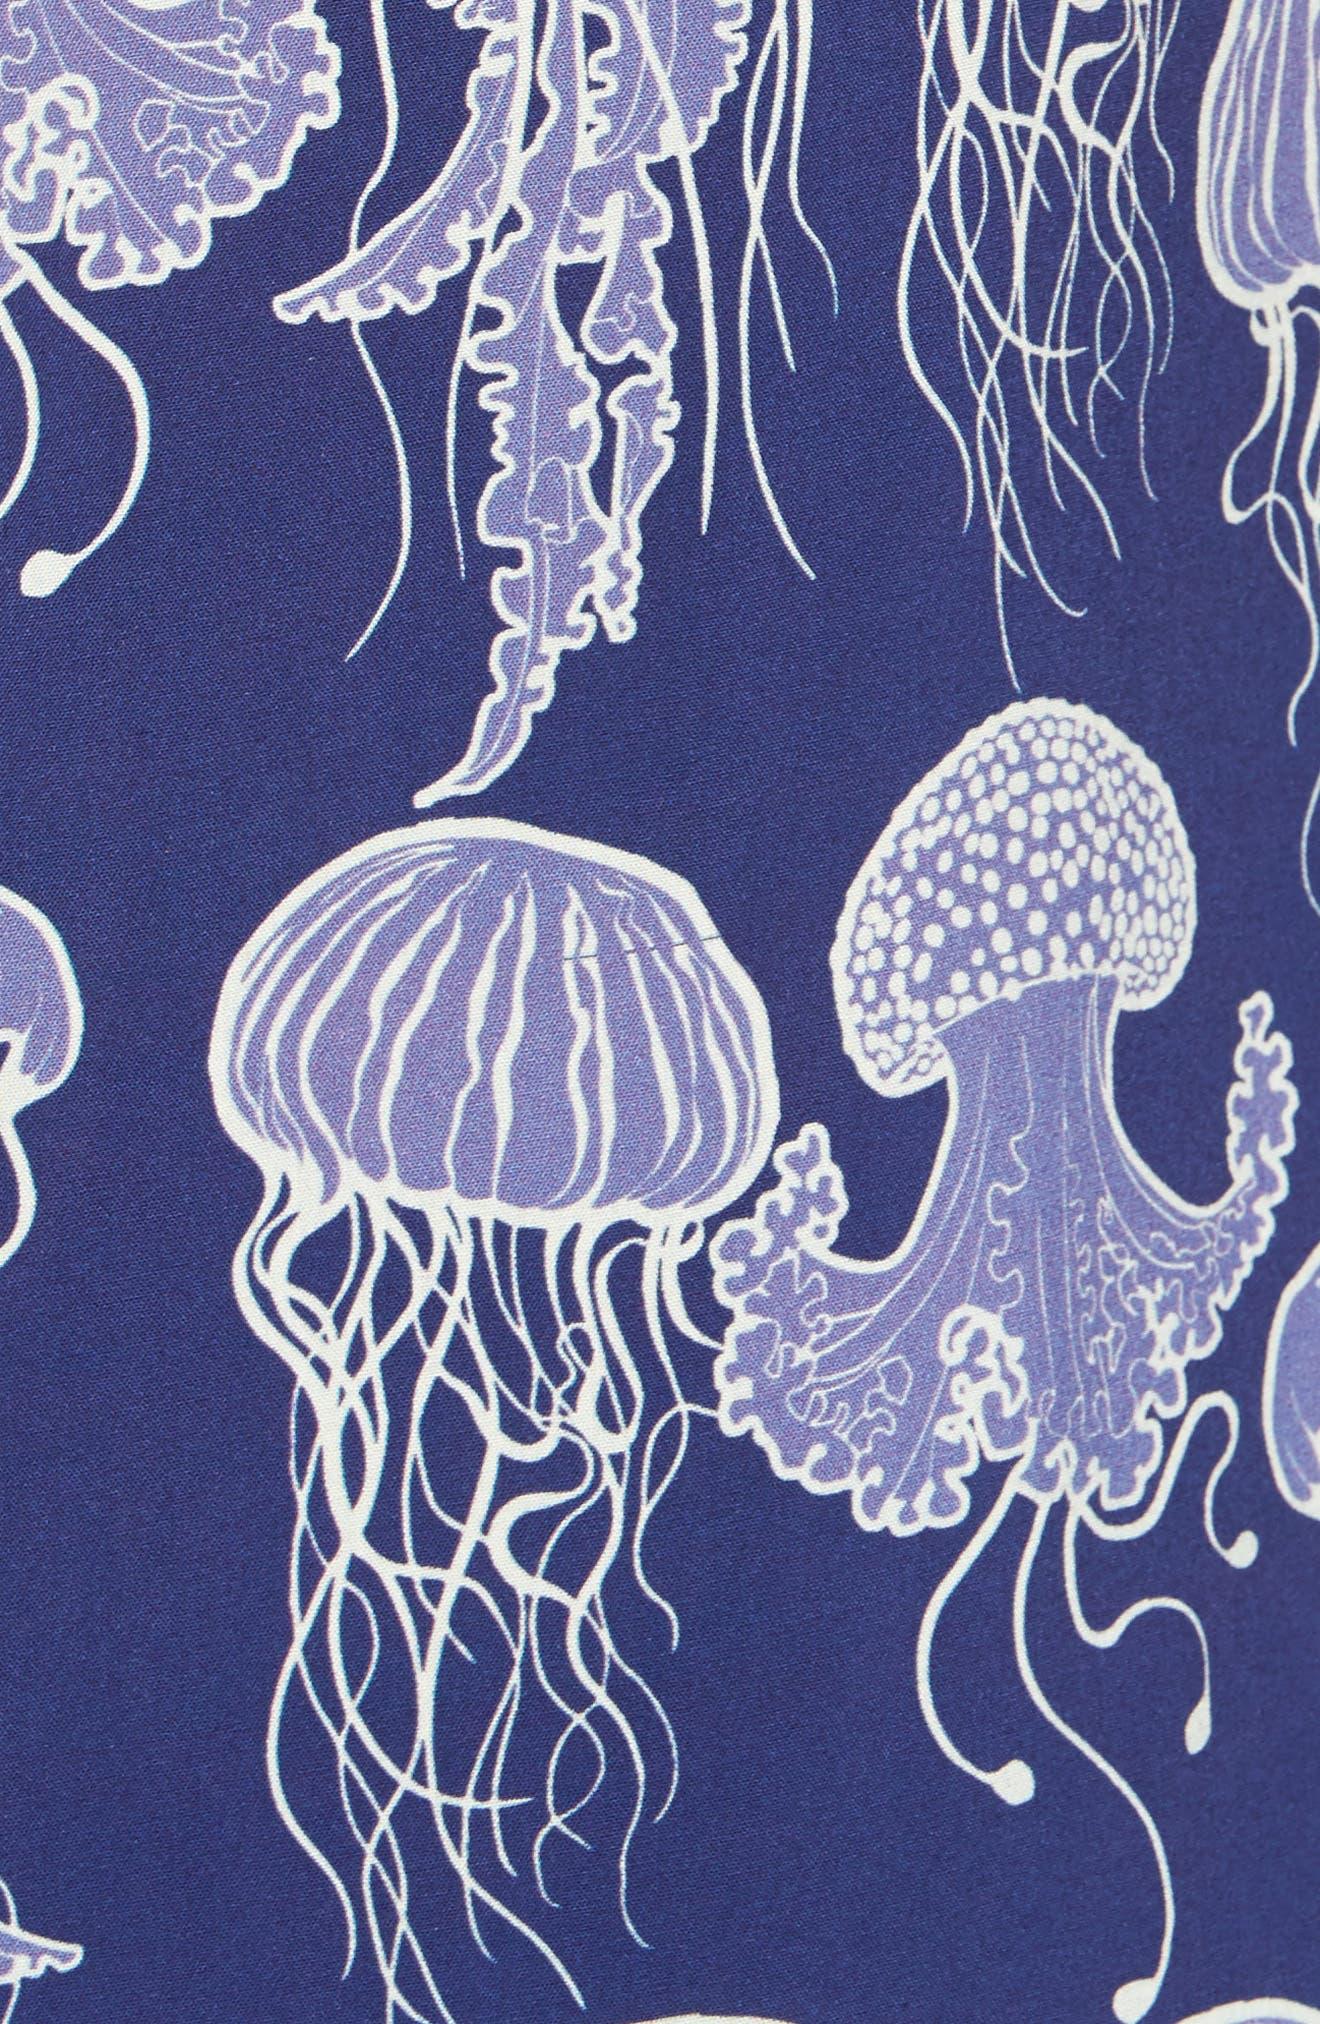 Jellyfish Print Camp Shirt,                             Alternate thumbnail 5, color,                             400